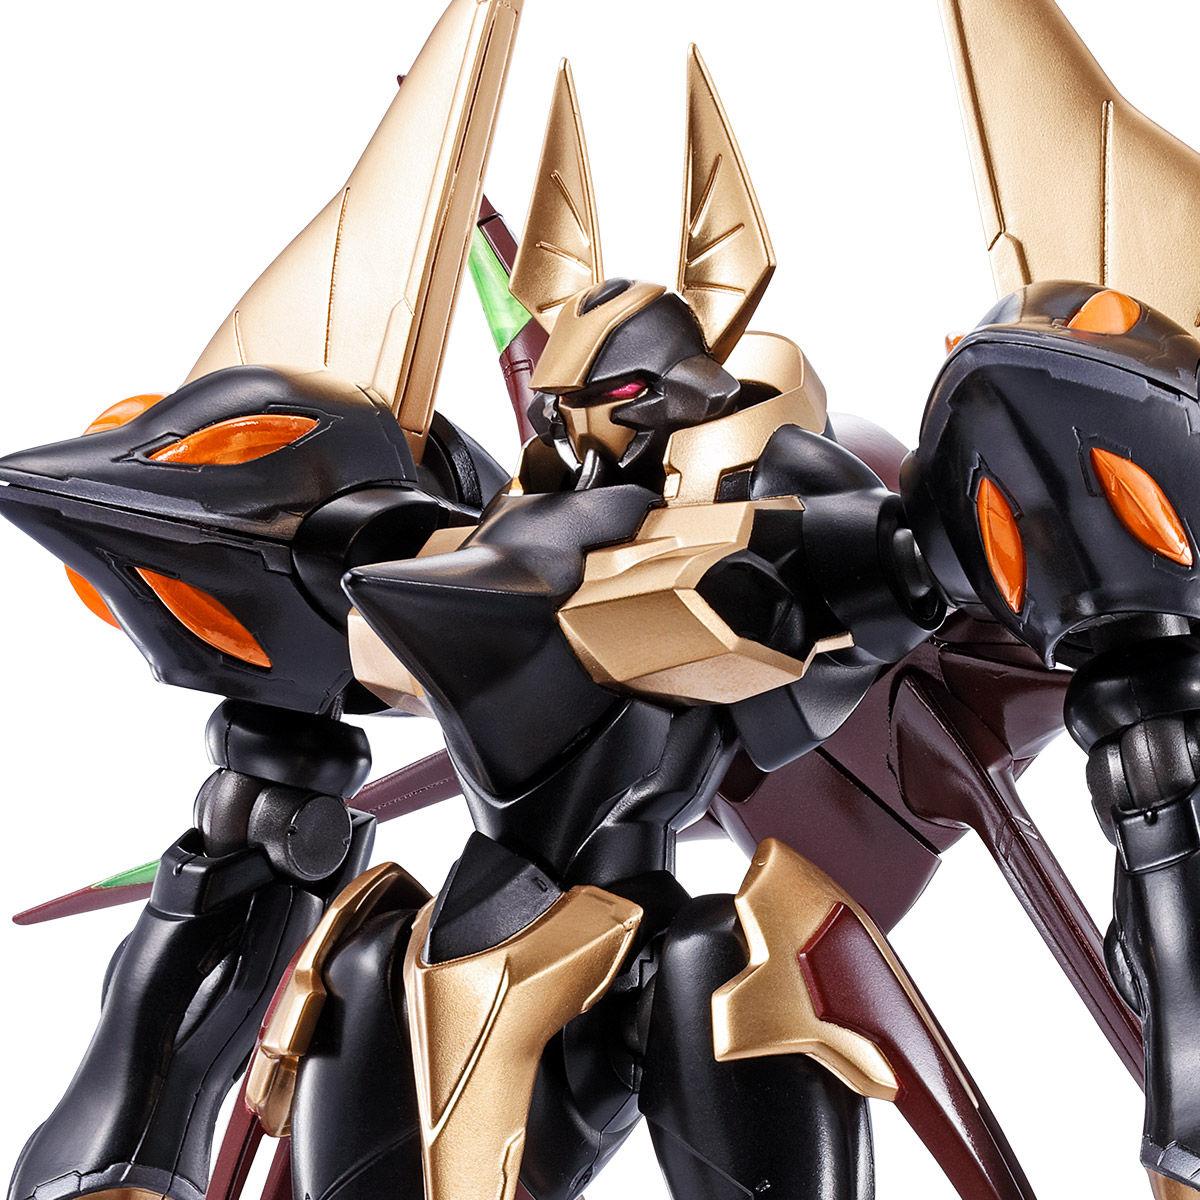 ROBOT魂〈SIDE KMF〉『ガウェイン ~BLACK REBELLION~』コードギアス 可動フィギュア-001